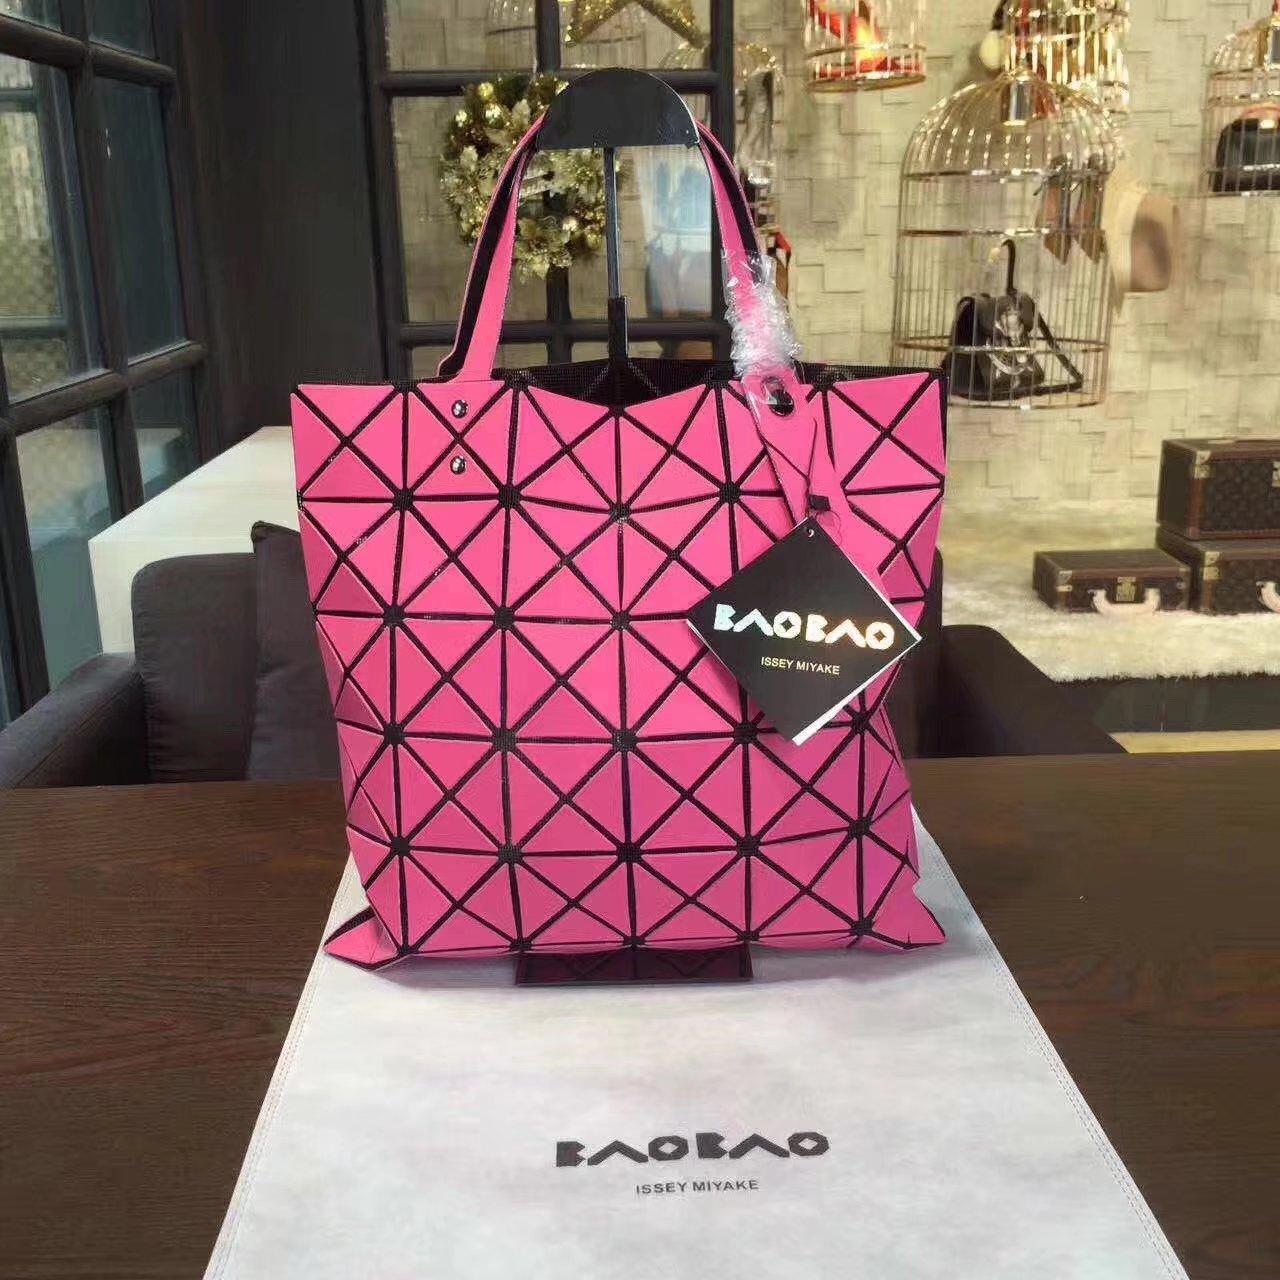 Issey Miyake Bao Bao Shopping Bag Pink